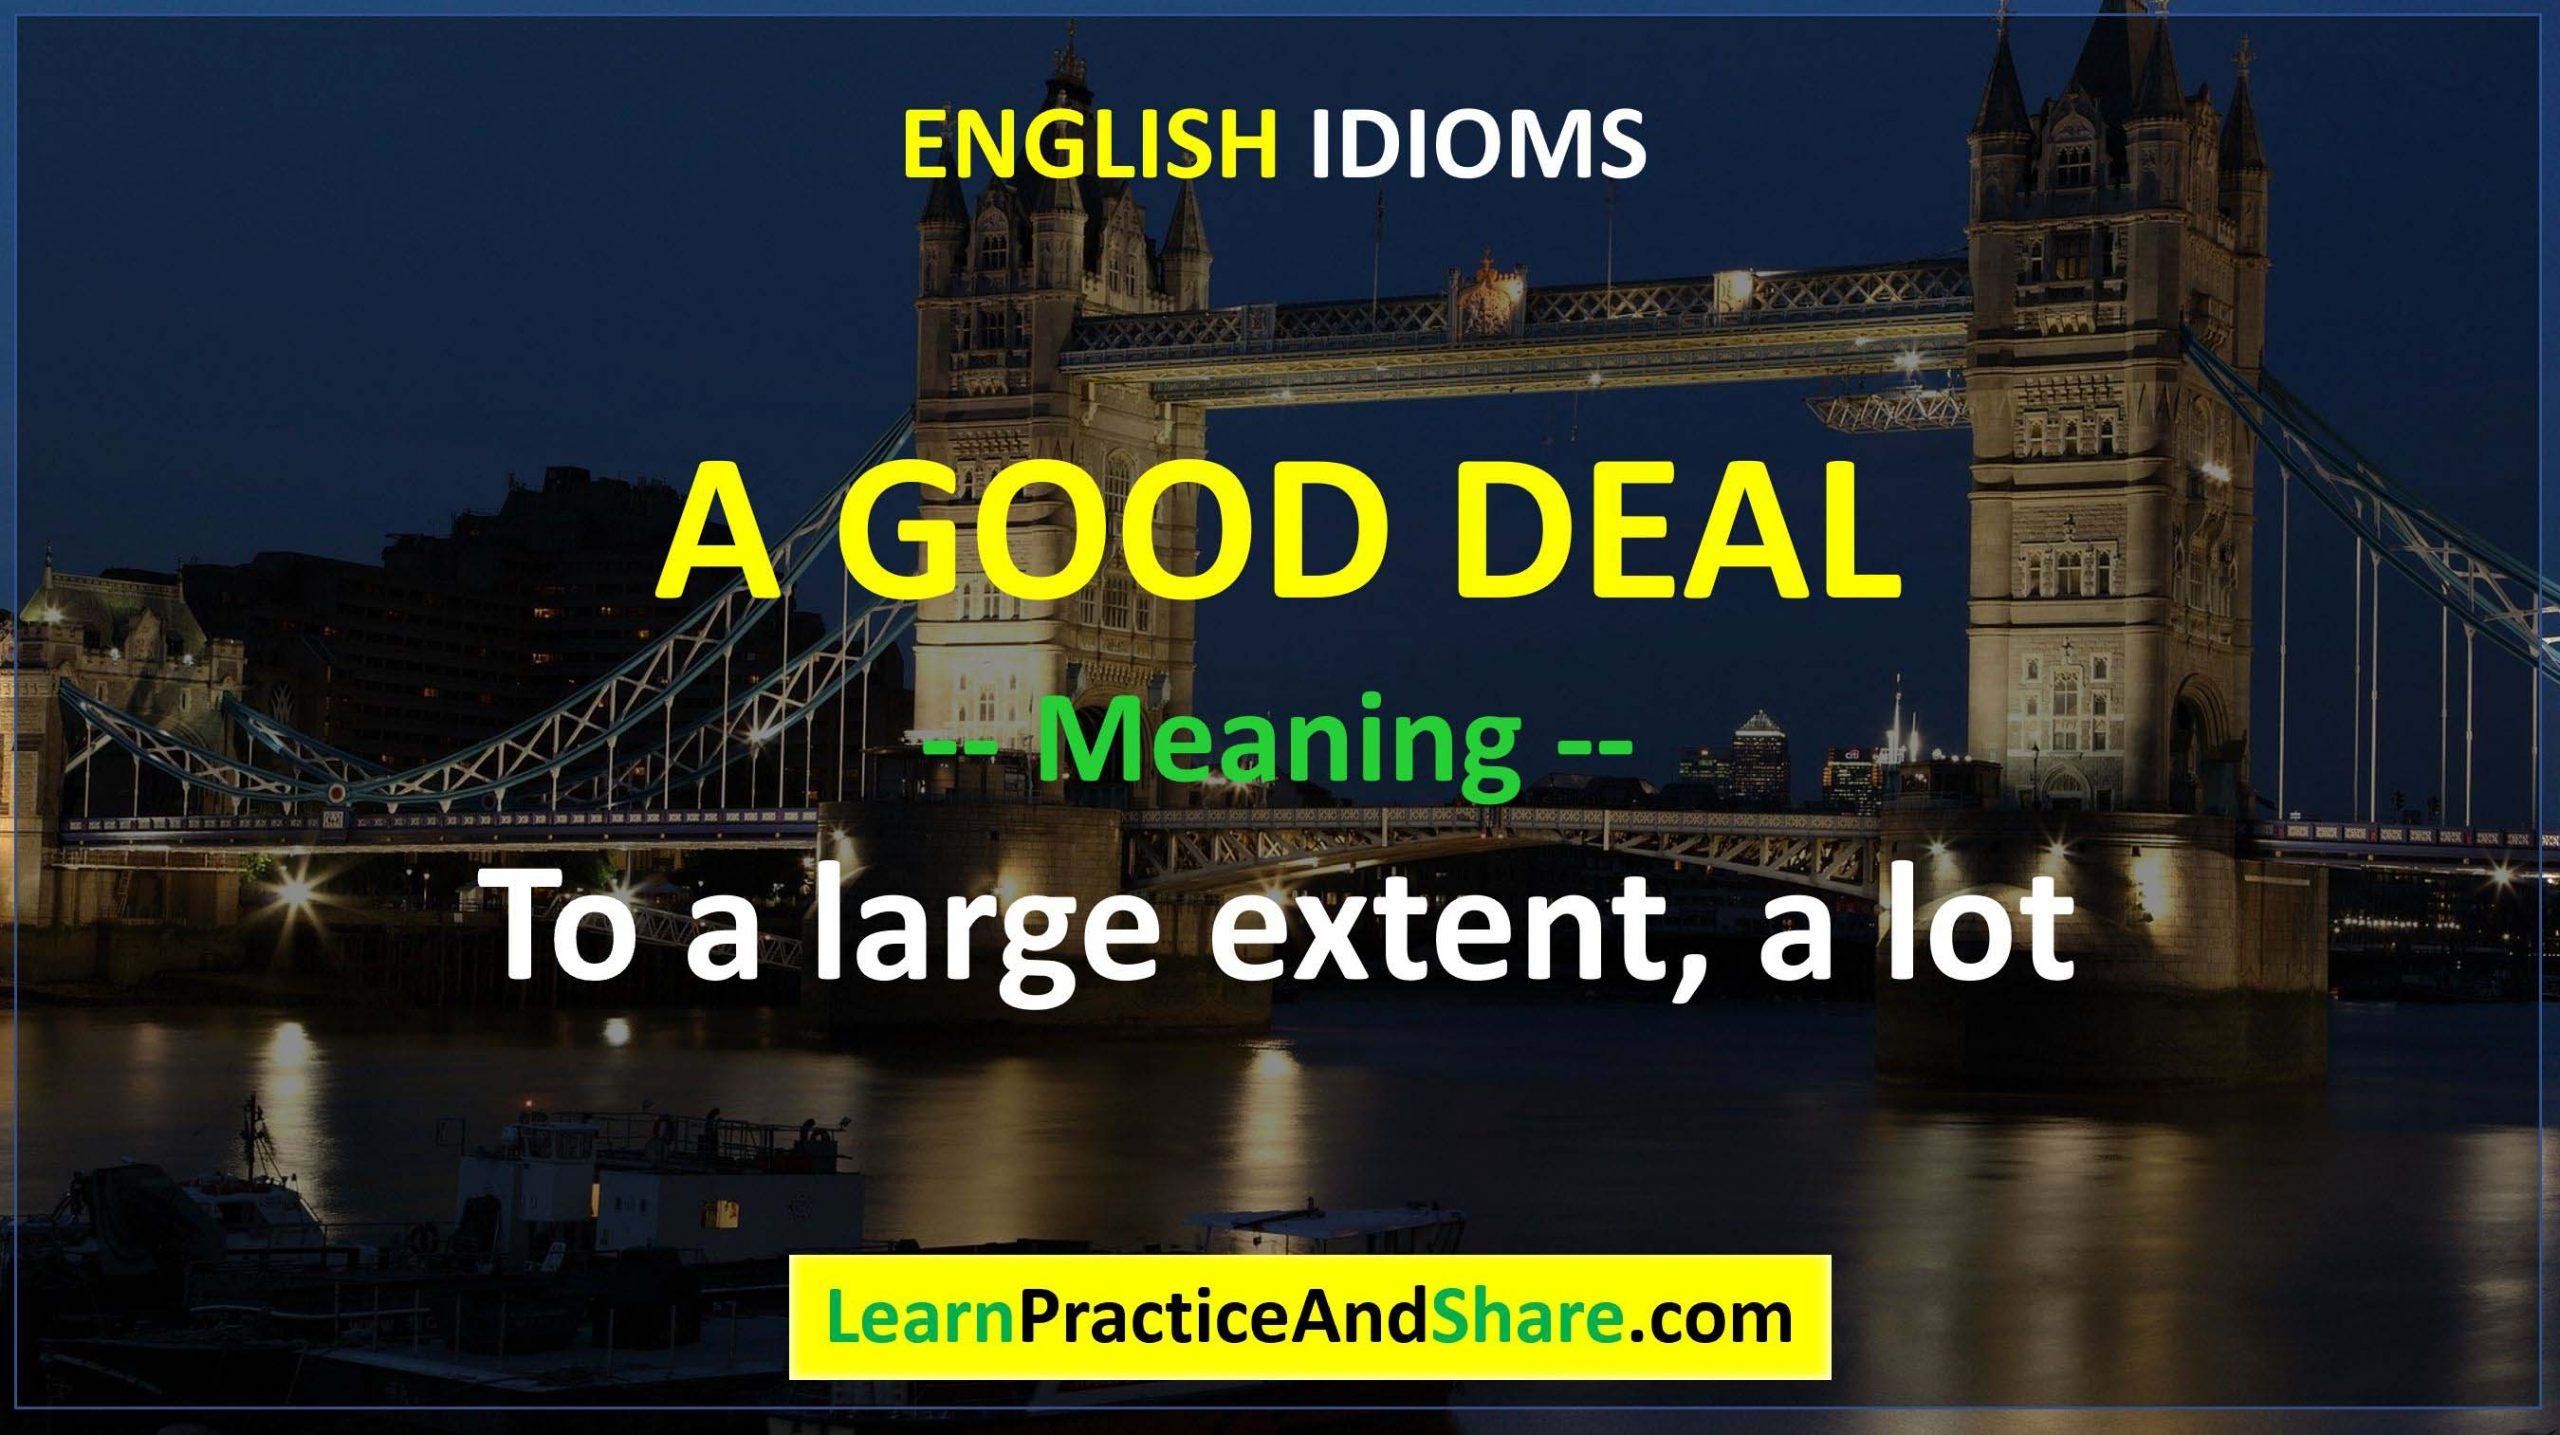 English Idiom - A Good Deal